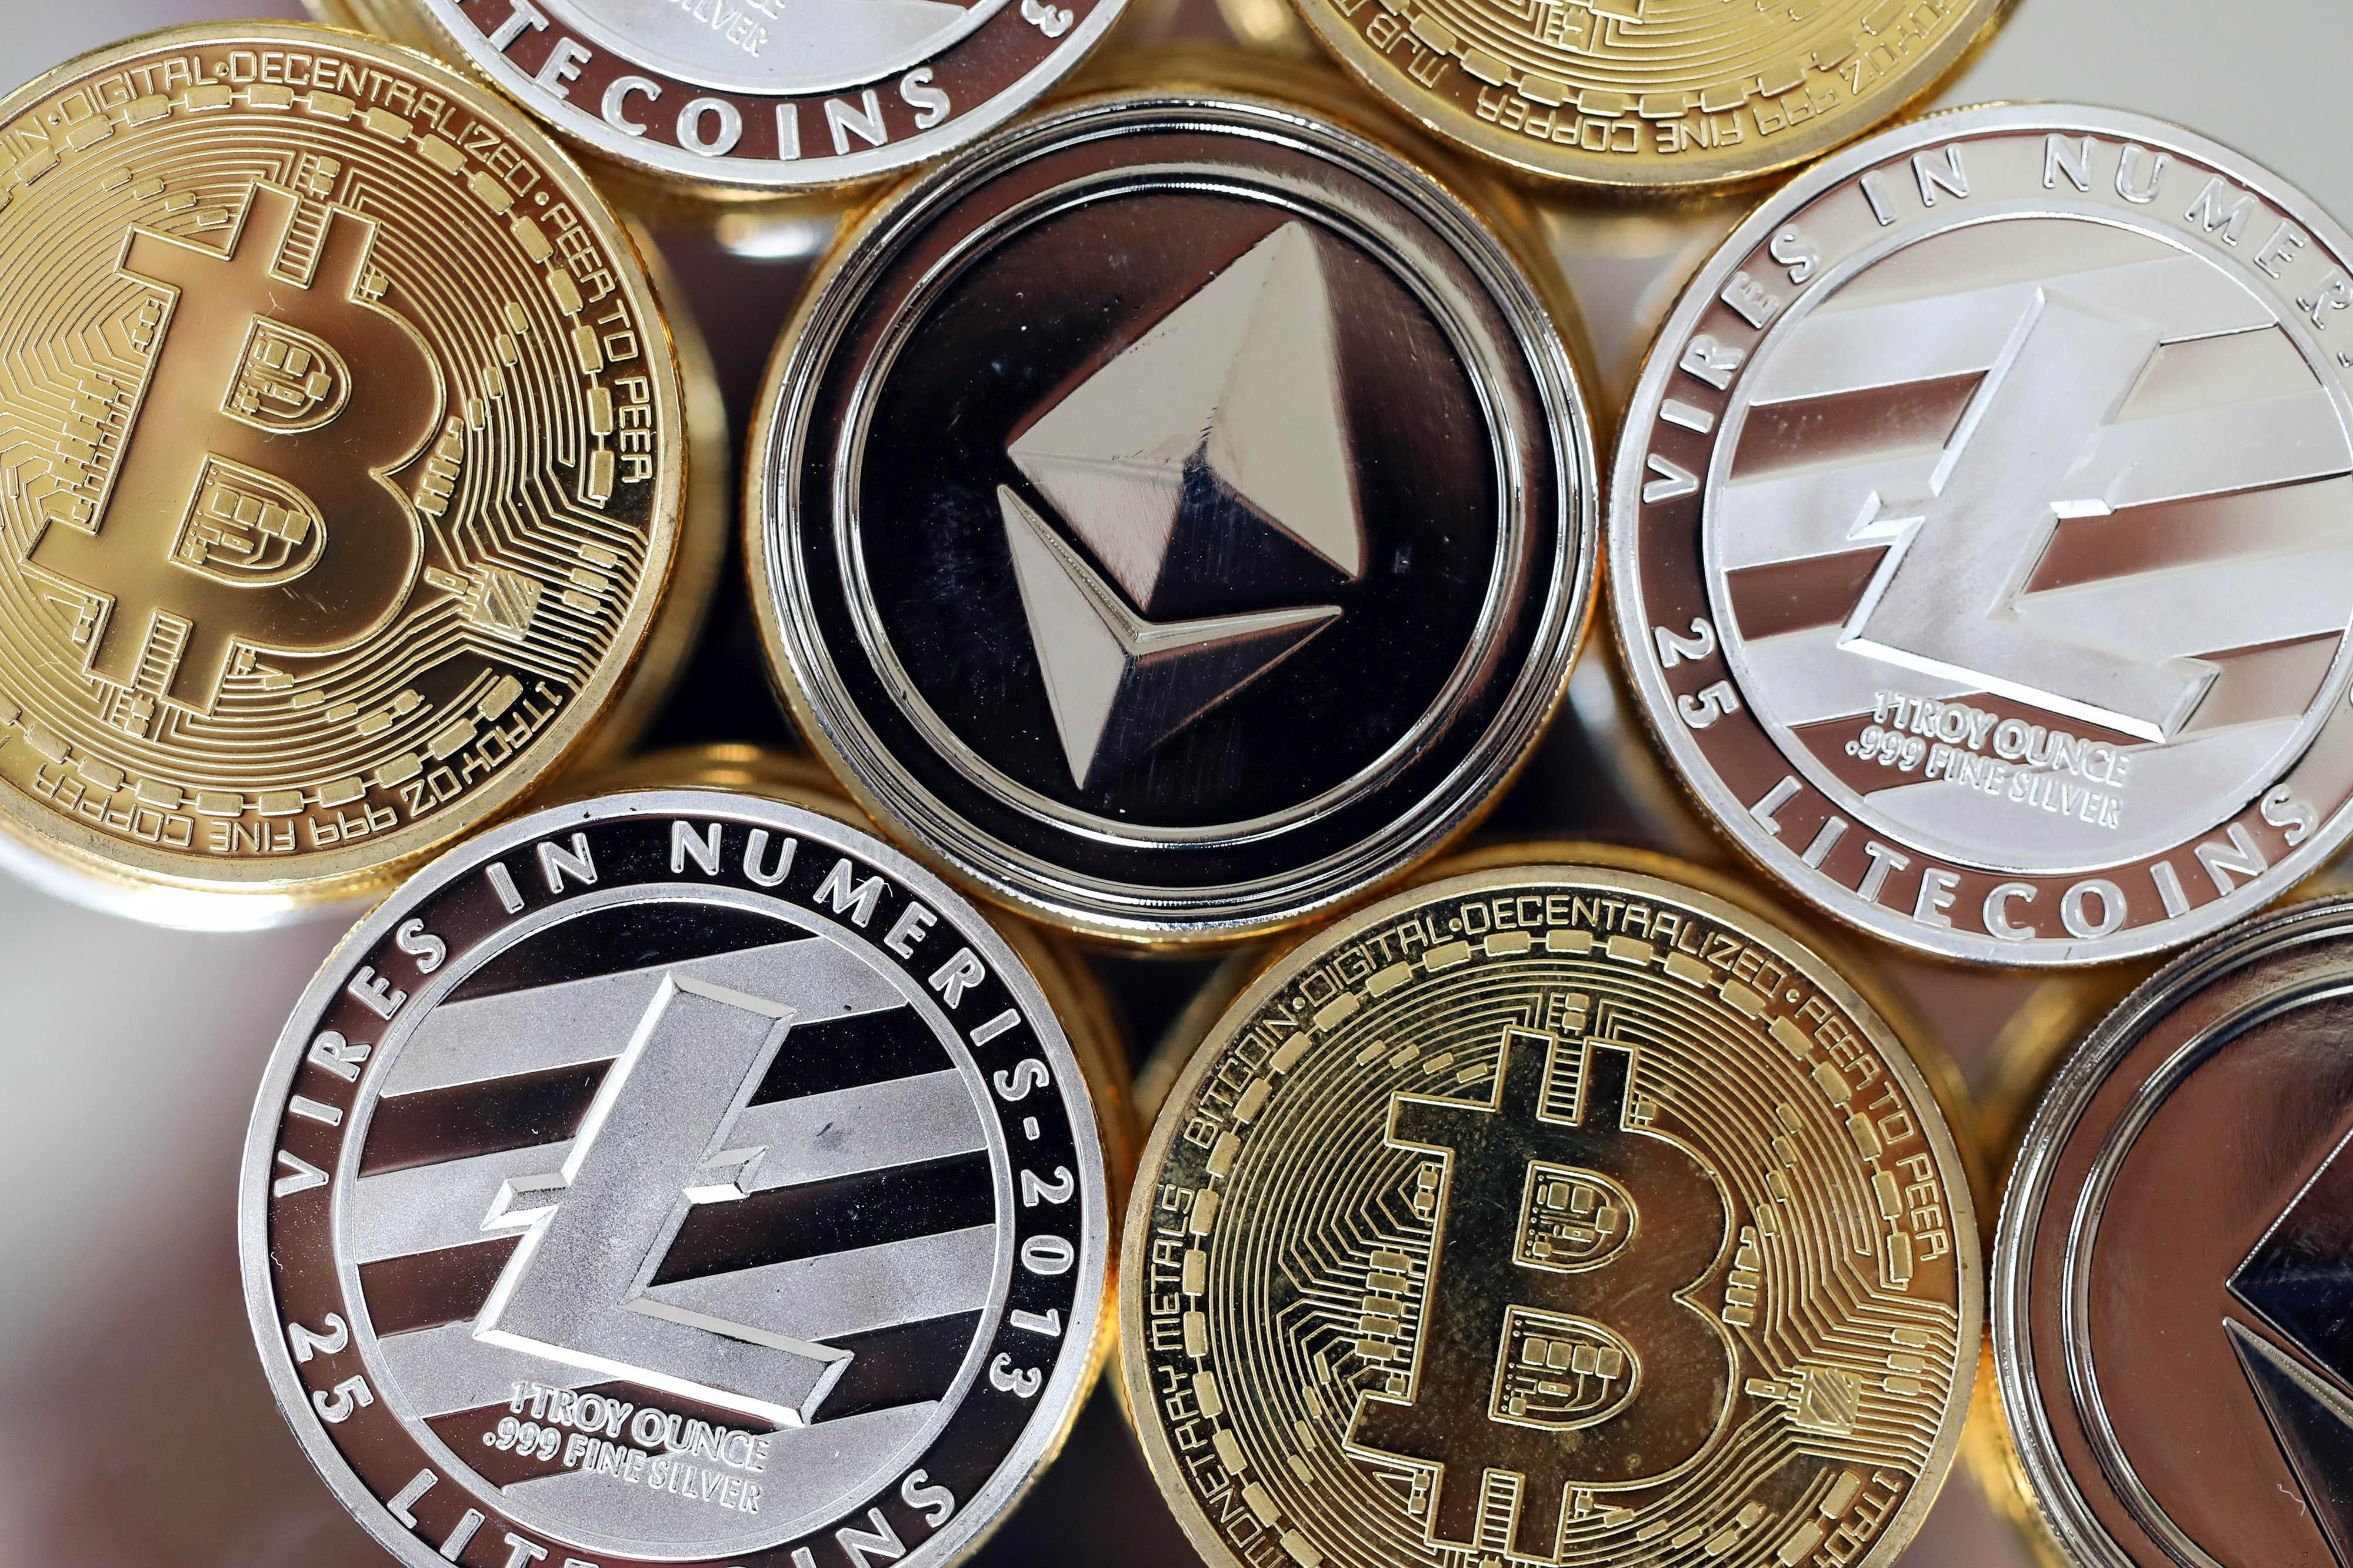 Bitcoins utopian geek community spread betting